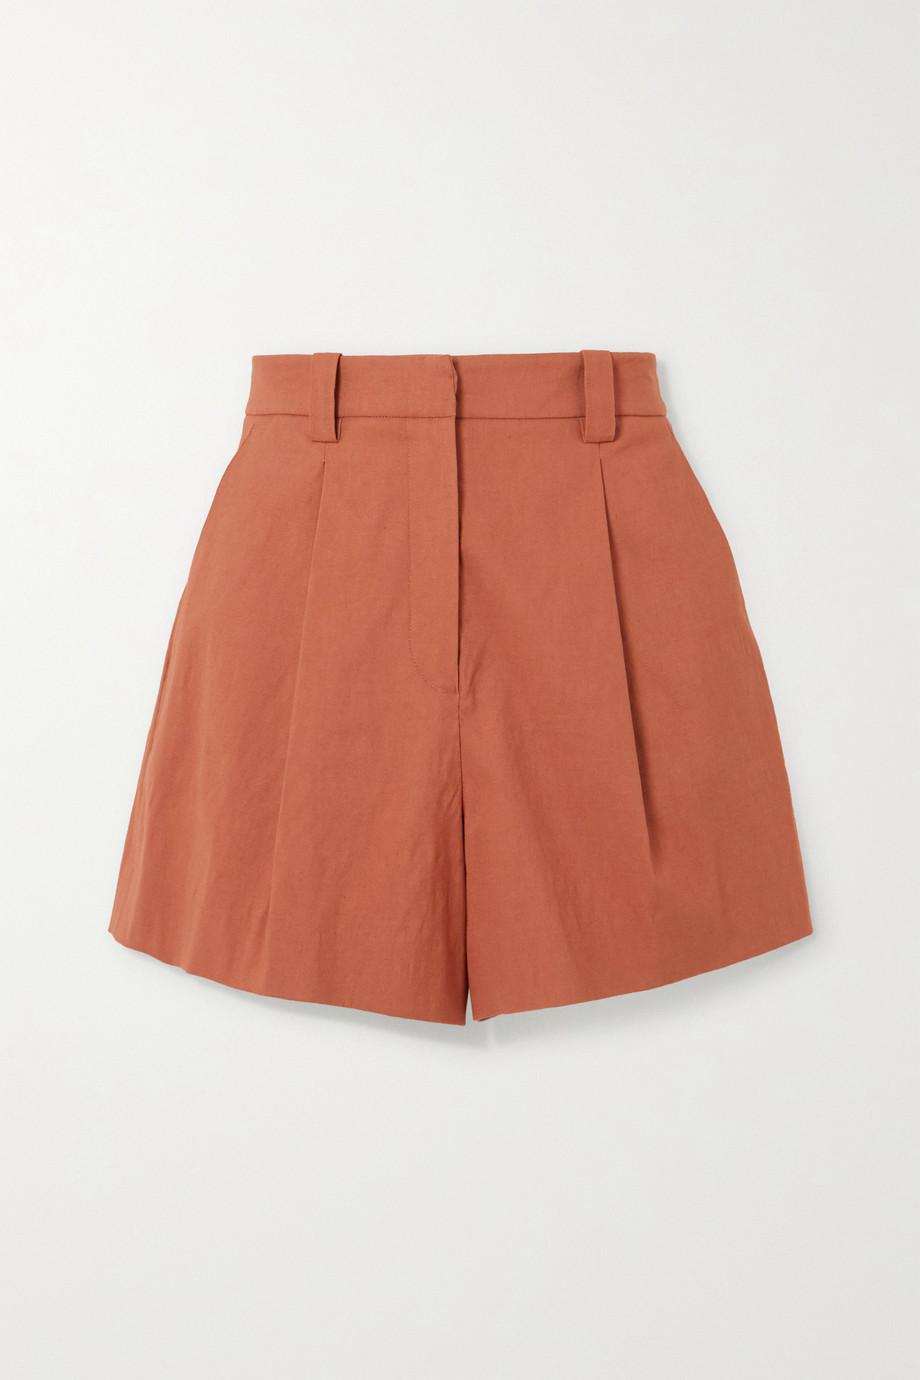 A.L.C. A.L.C. x Petra Flannery Huxley Shorts aus einer Leinenmischung